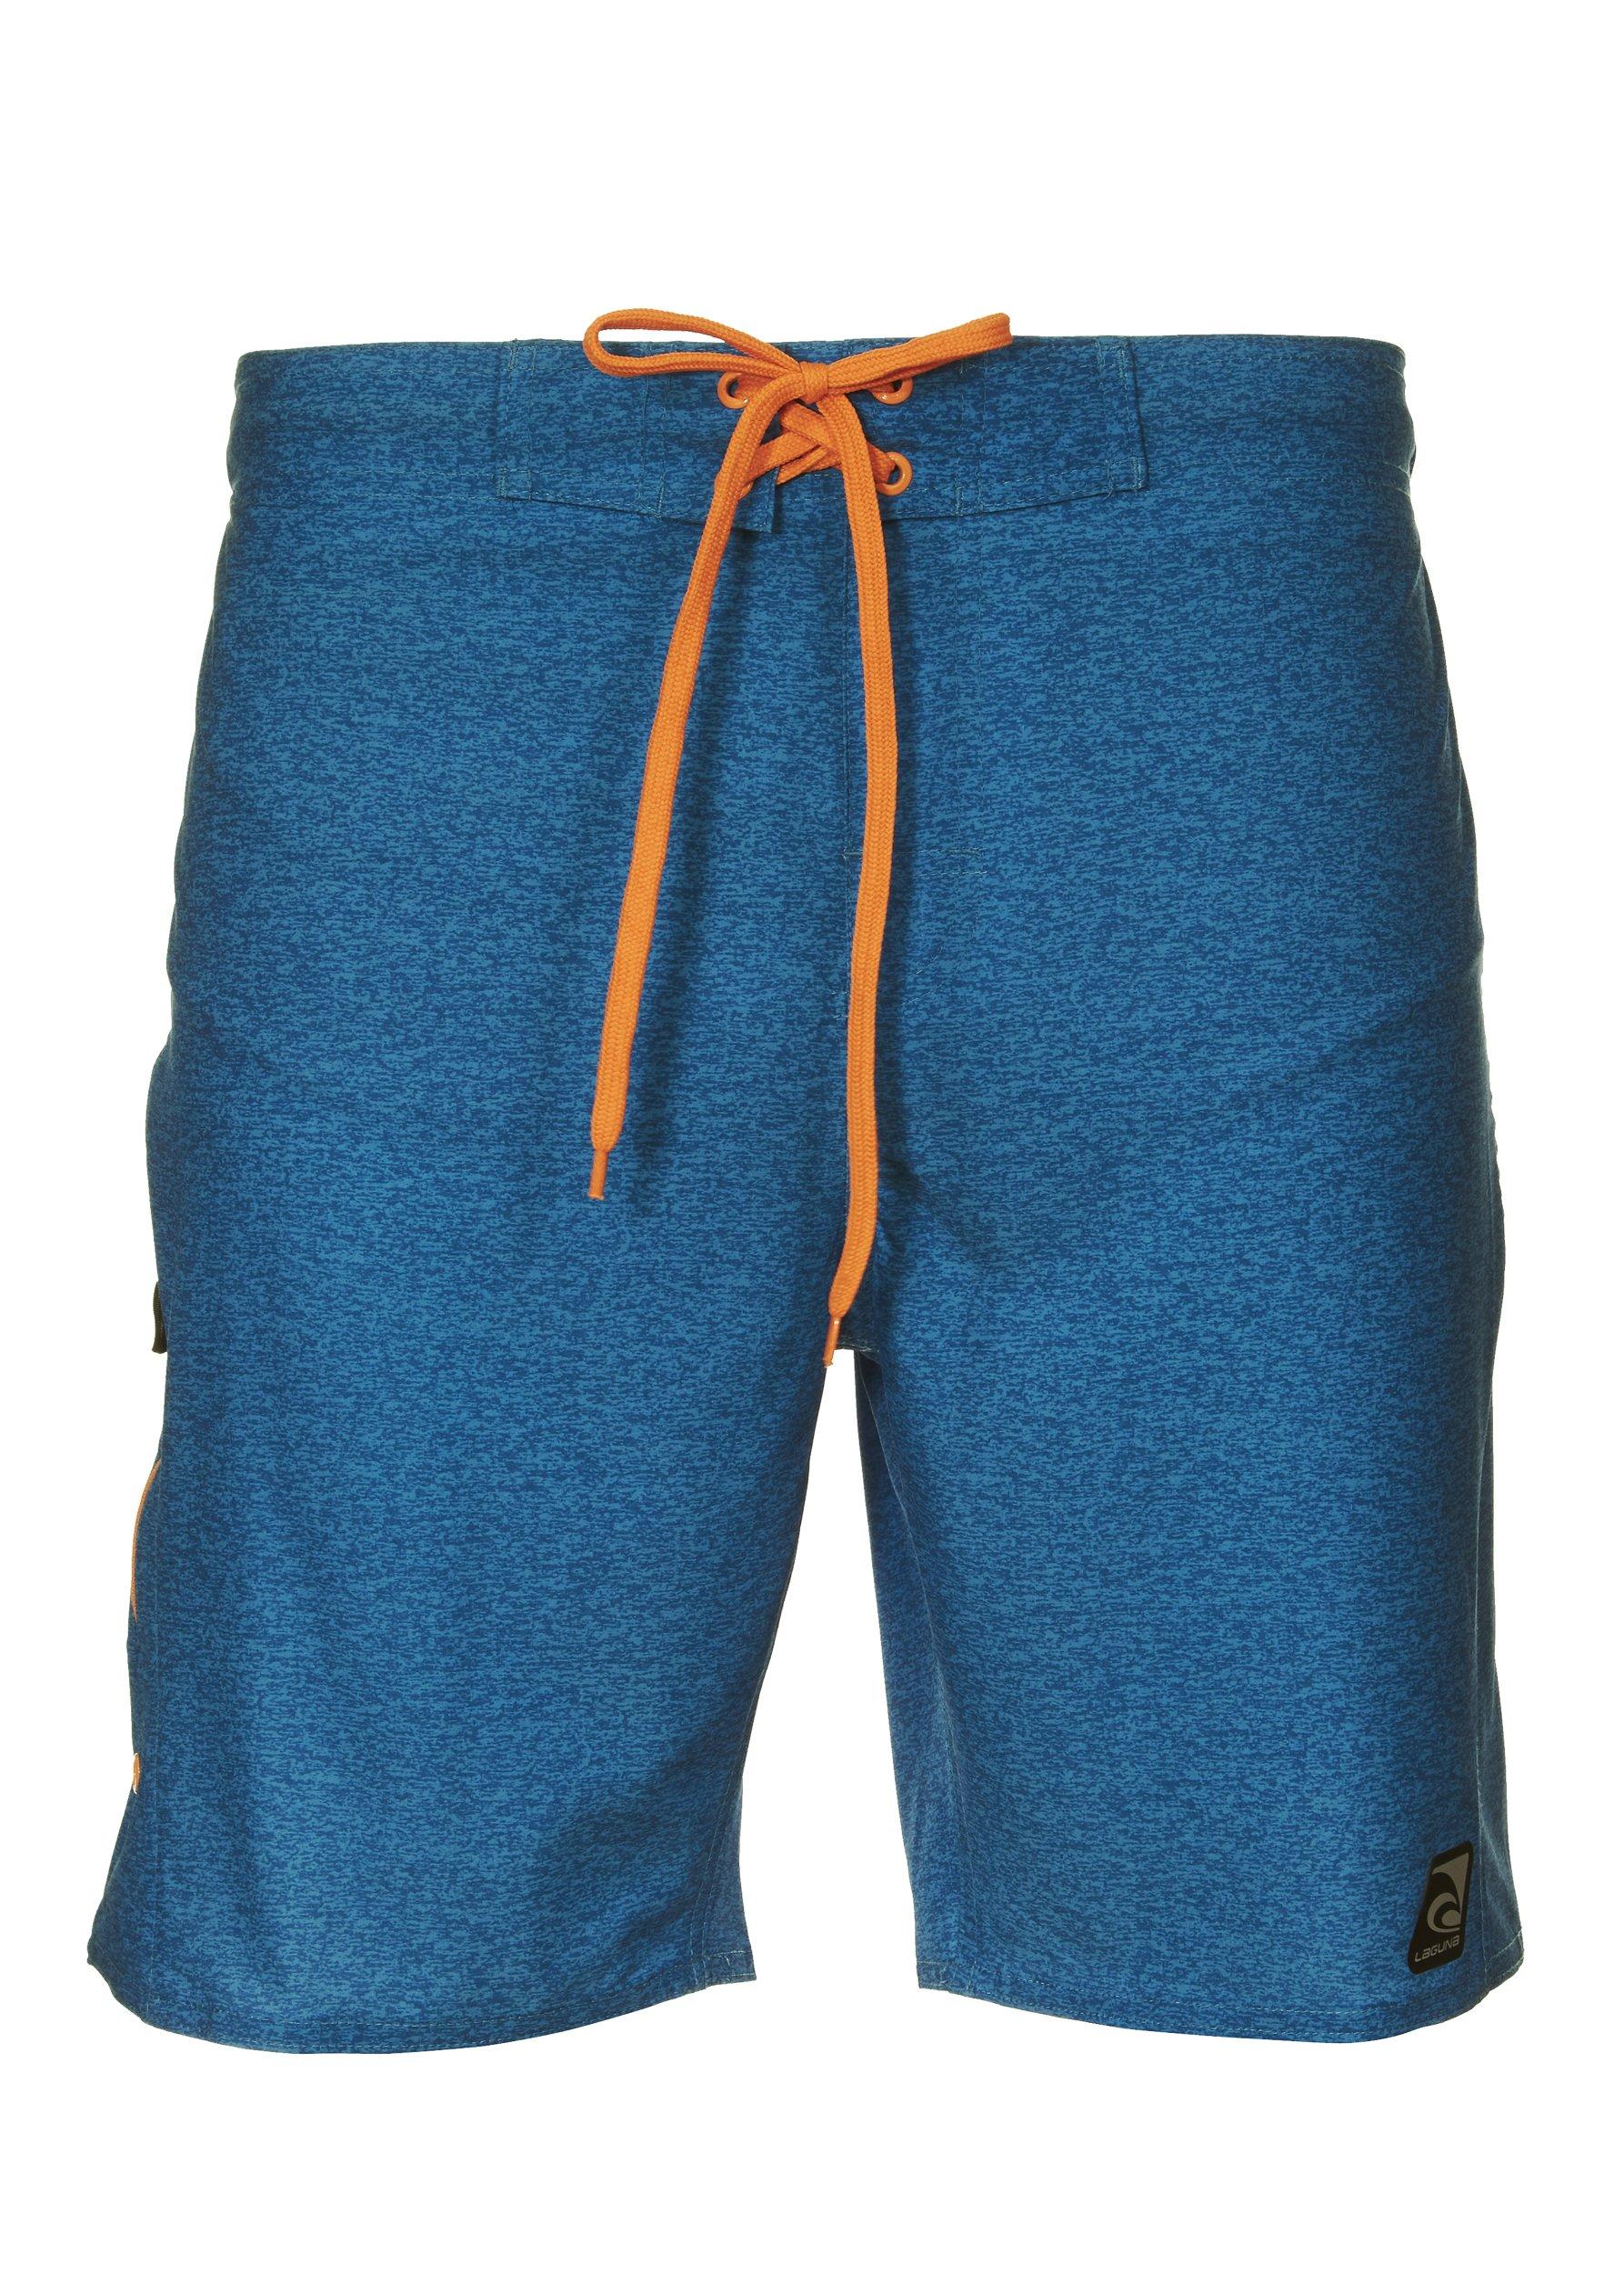 Laguna Mens Stretch Boardshort Swim Trunks Bathing Suits Blue/Heather X-Large